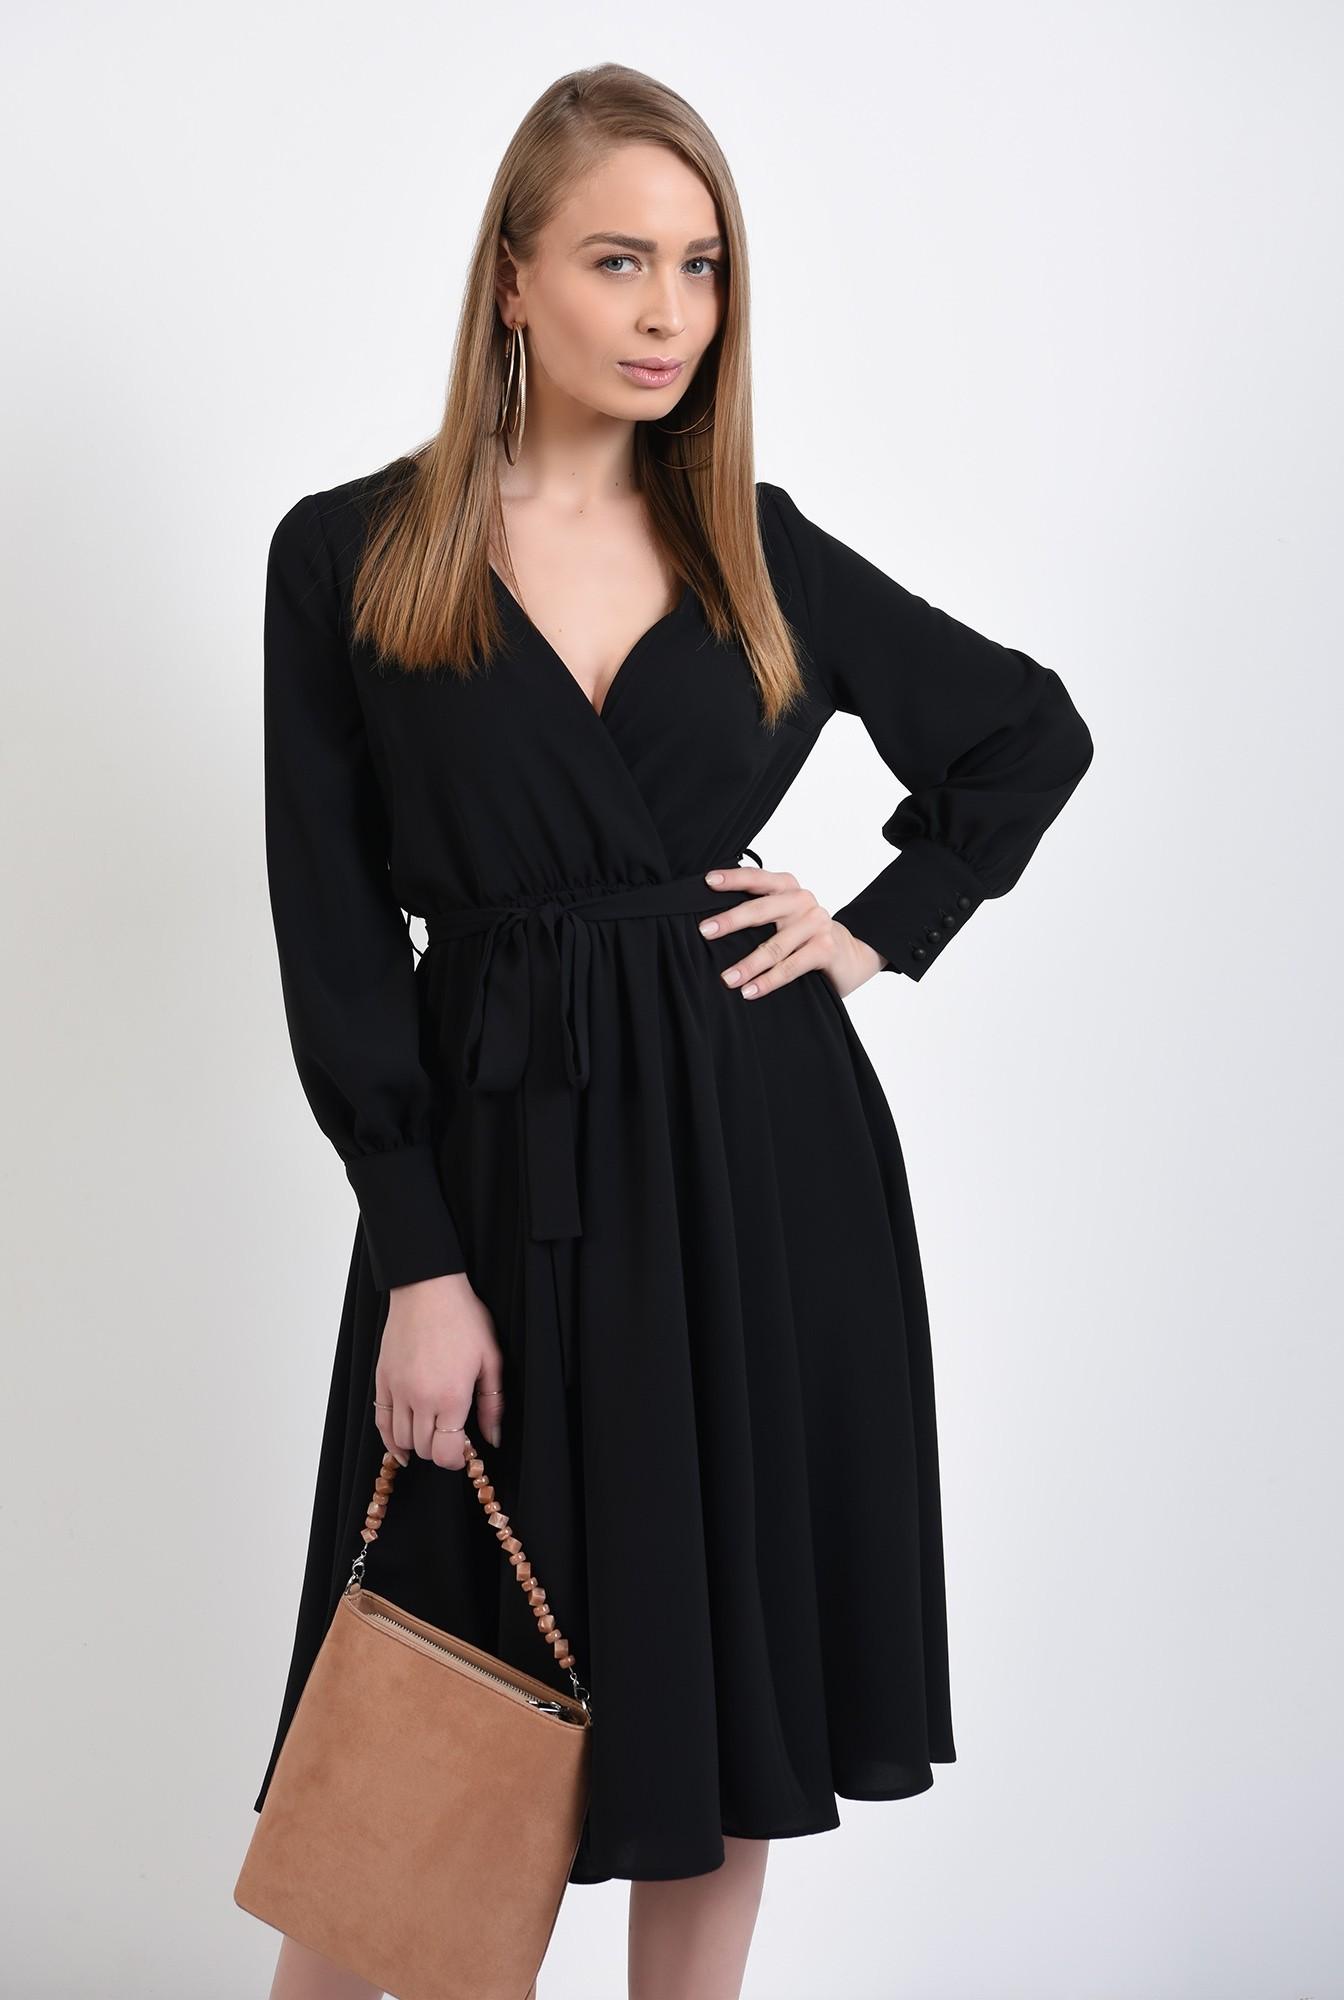 rochie neagra, cu anchior petrecut, midi, evazata, cu cordon, rochie de primavara